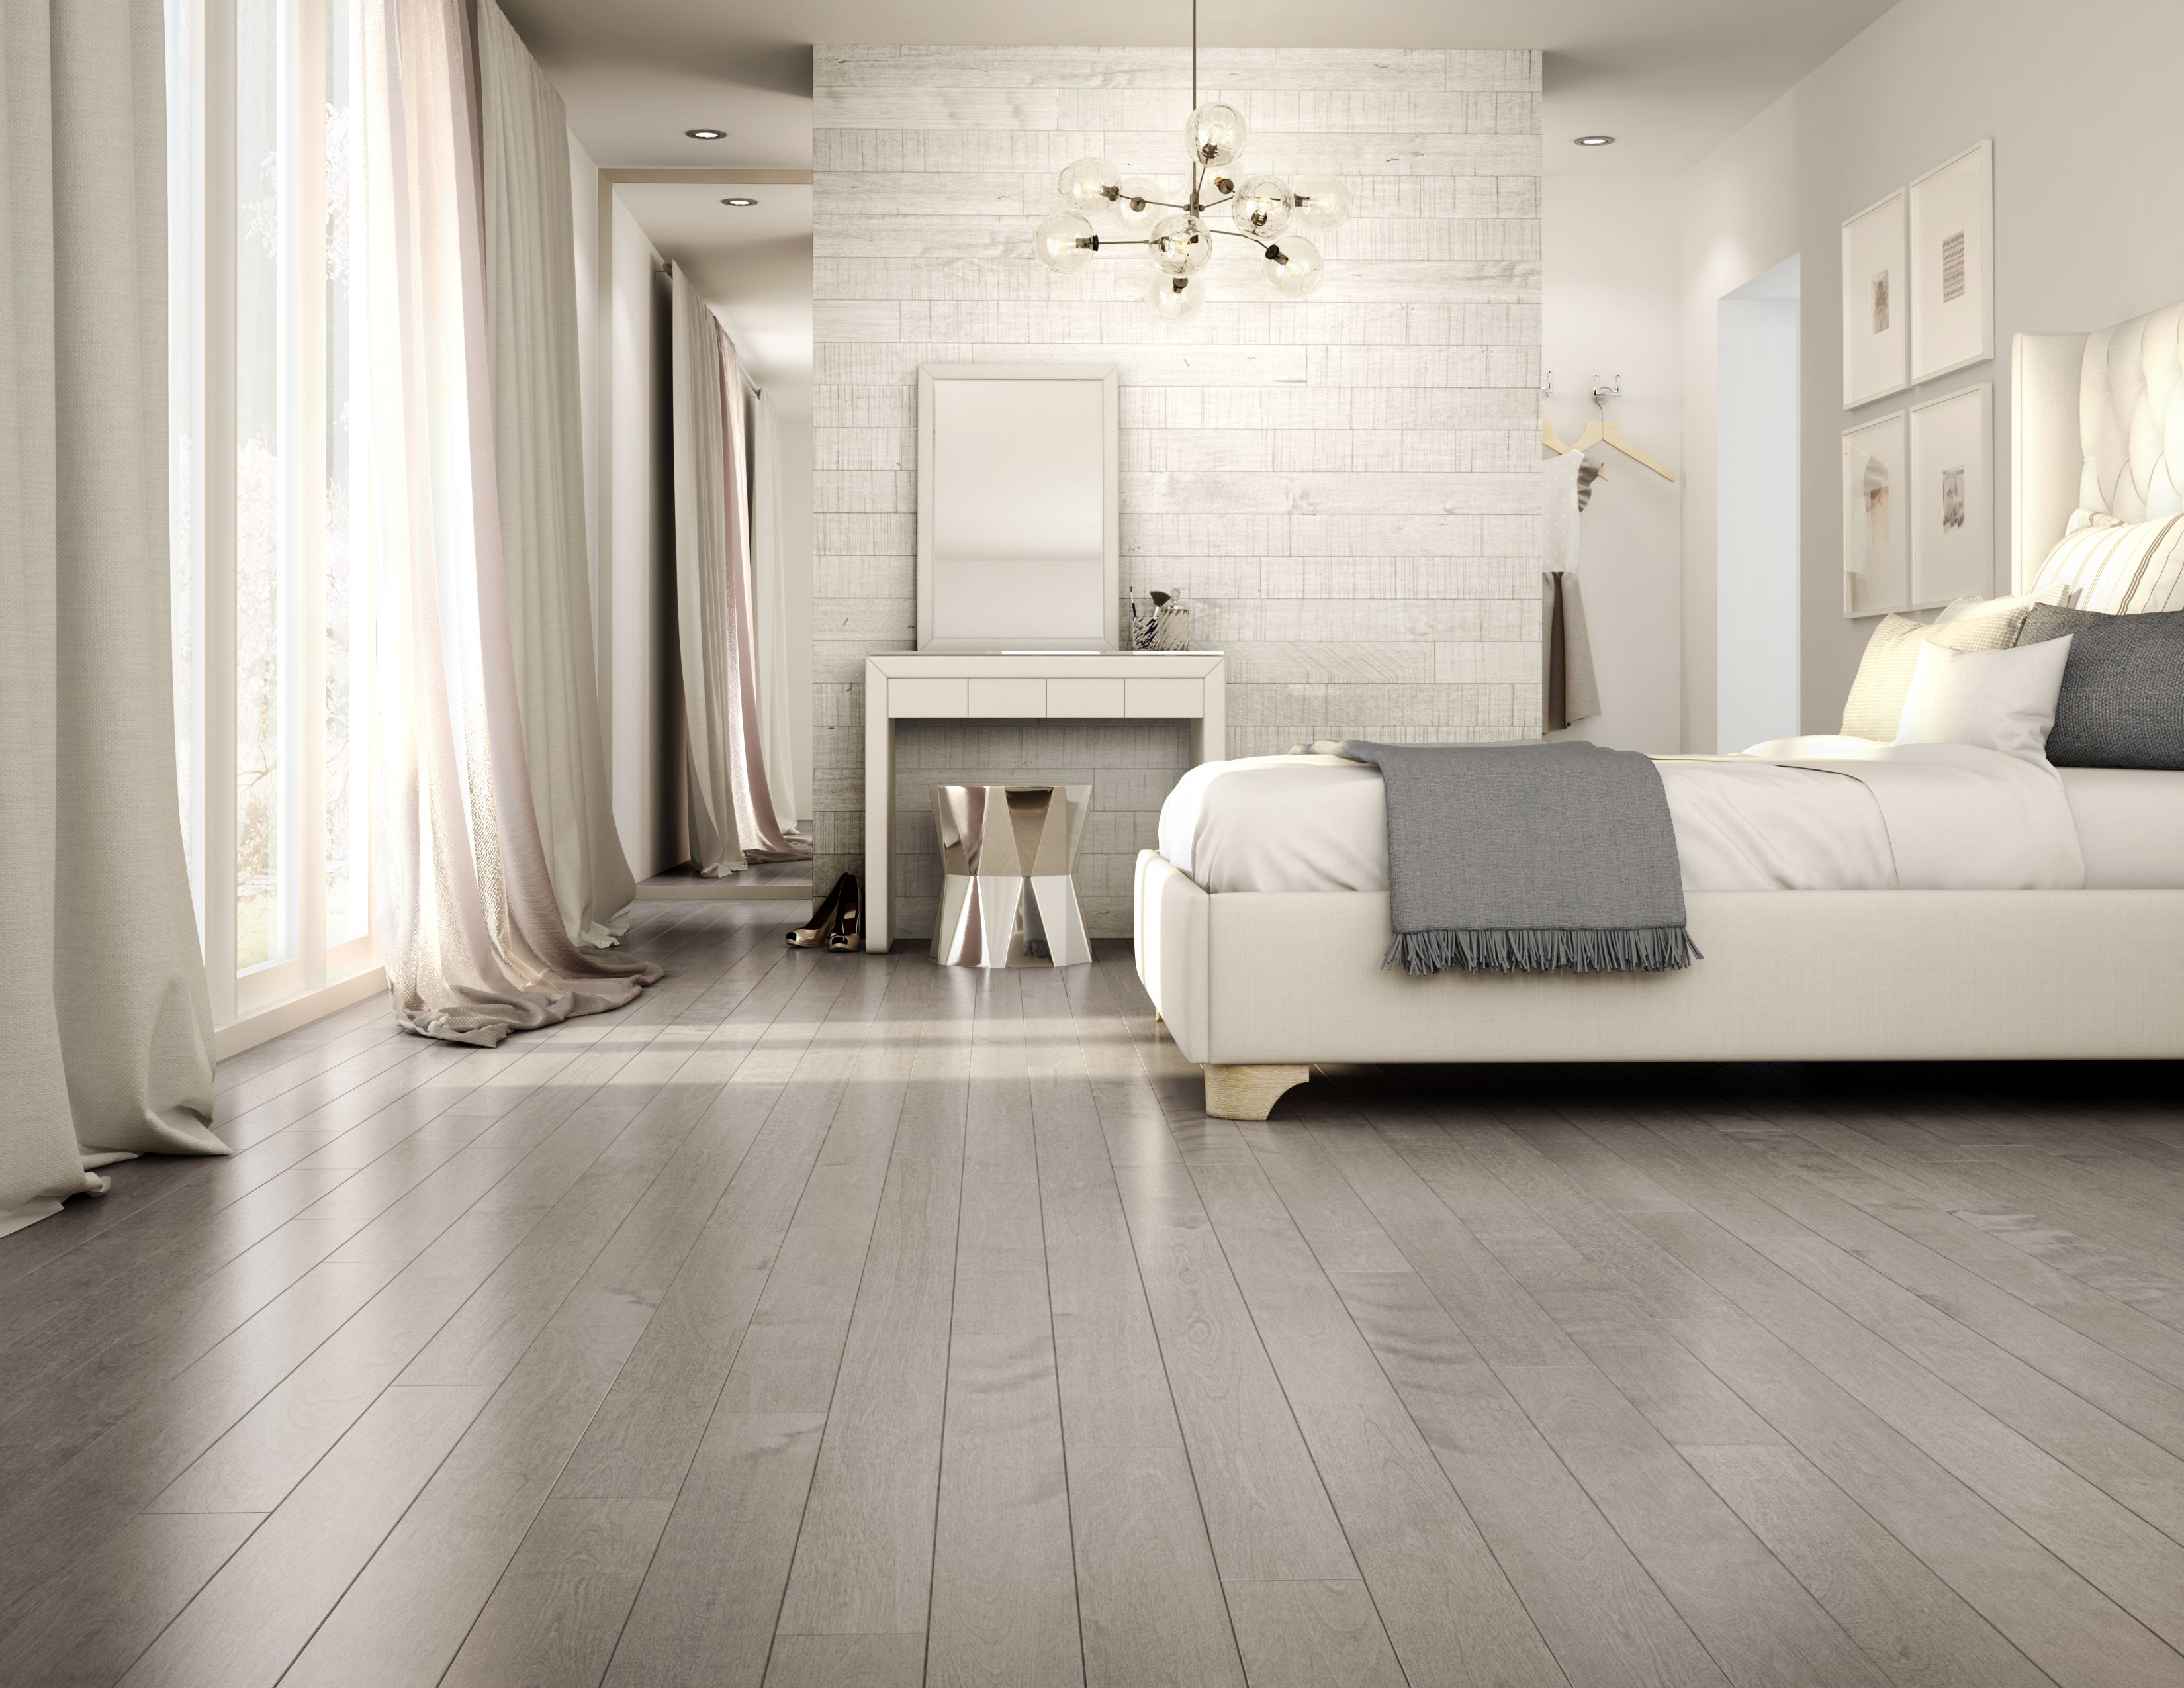 Calm and peaceful bedroom Preverco hardwood floors On